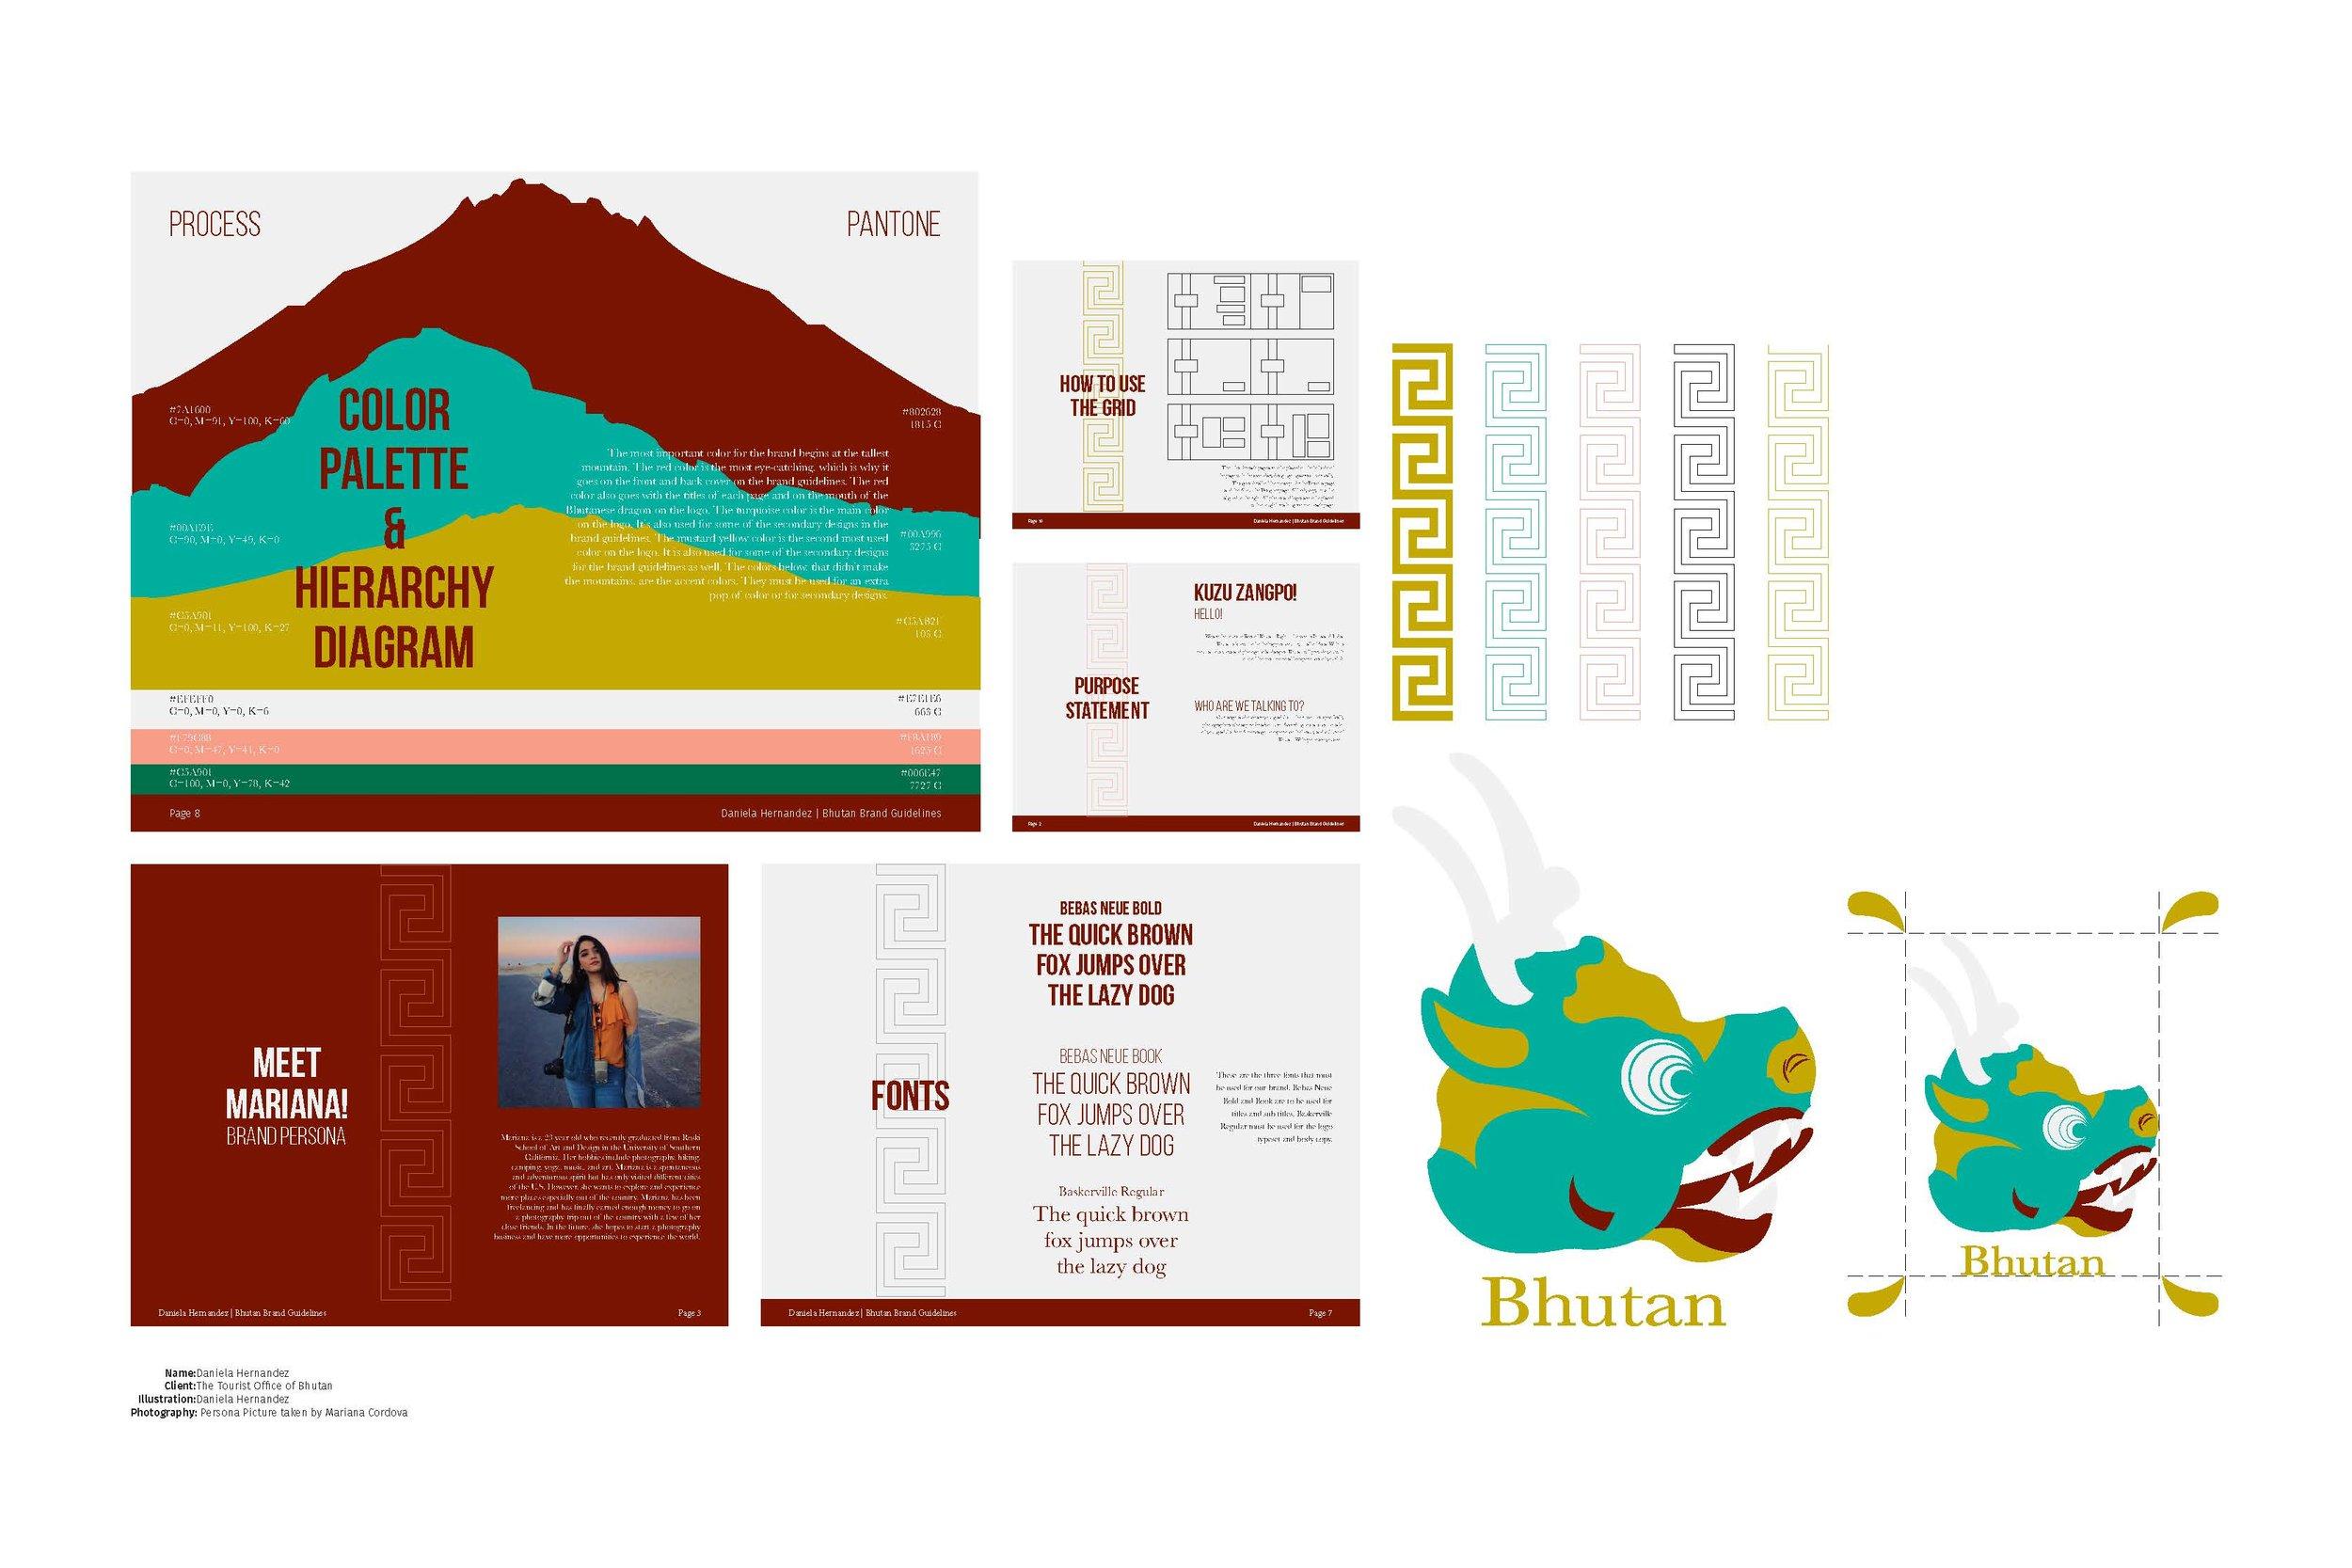 bhutan bg presentation board.jpg